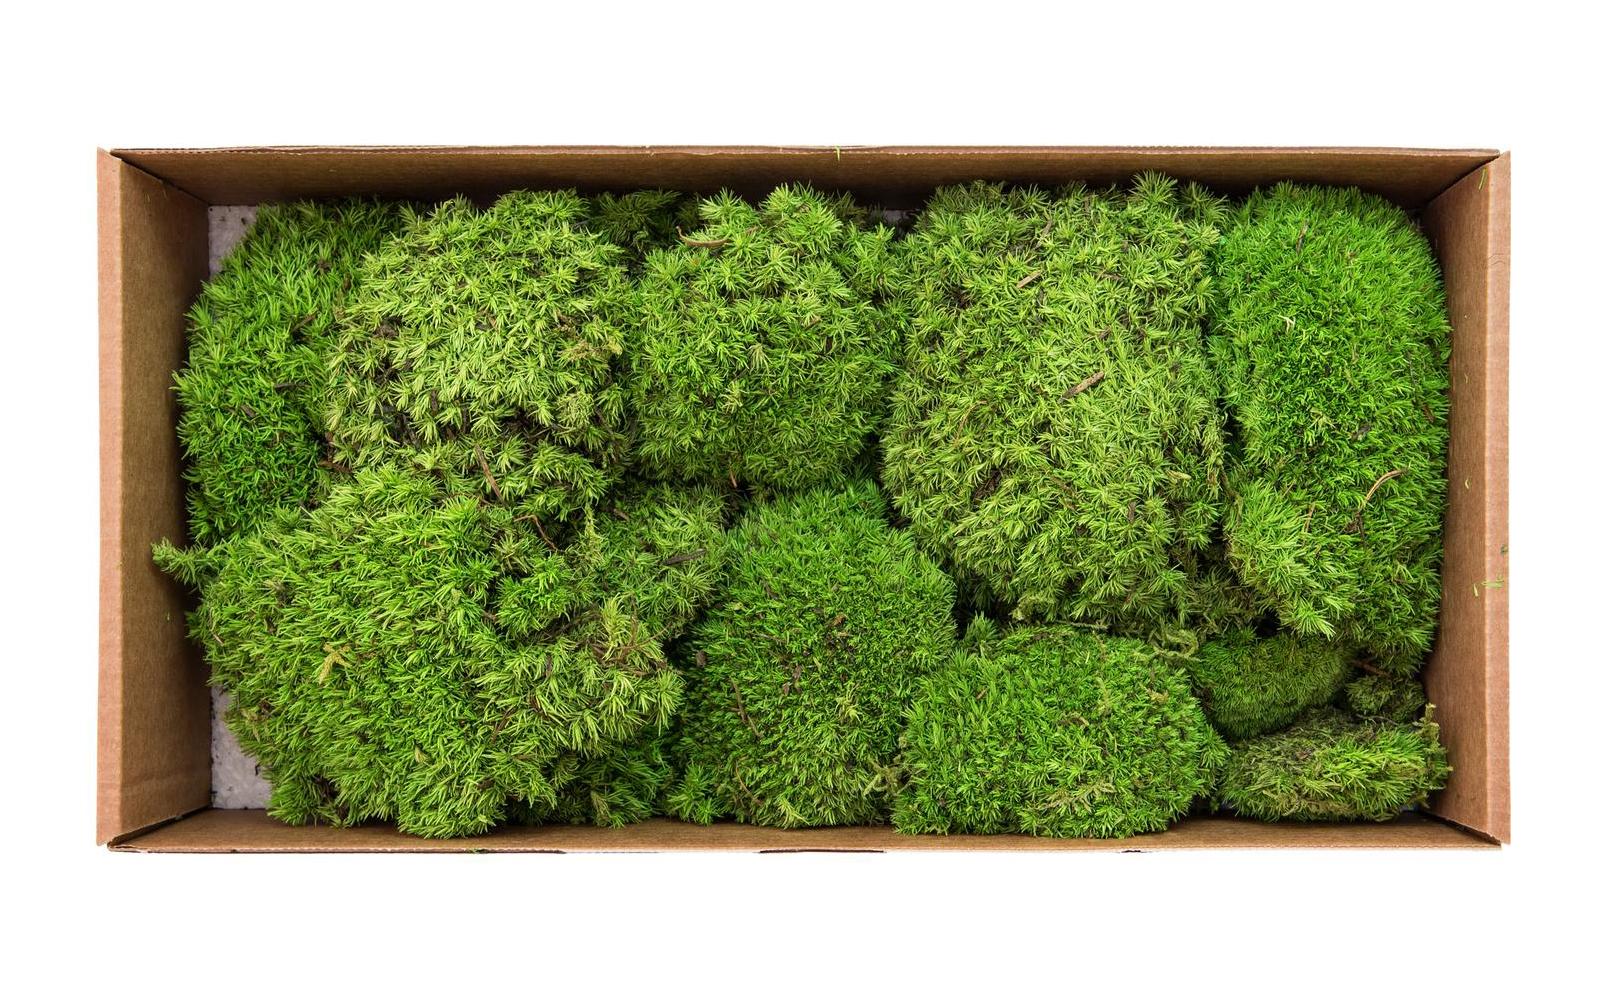 europalms-moosflecken-apfelgra-n-pra-pariert-10x-kunststoffpflanze